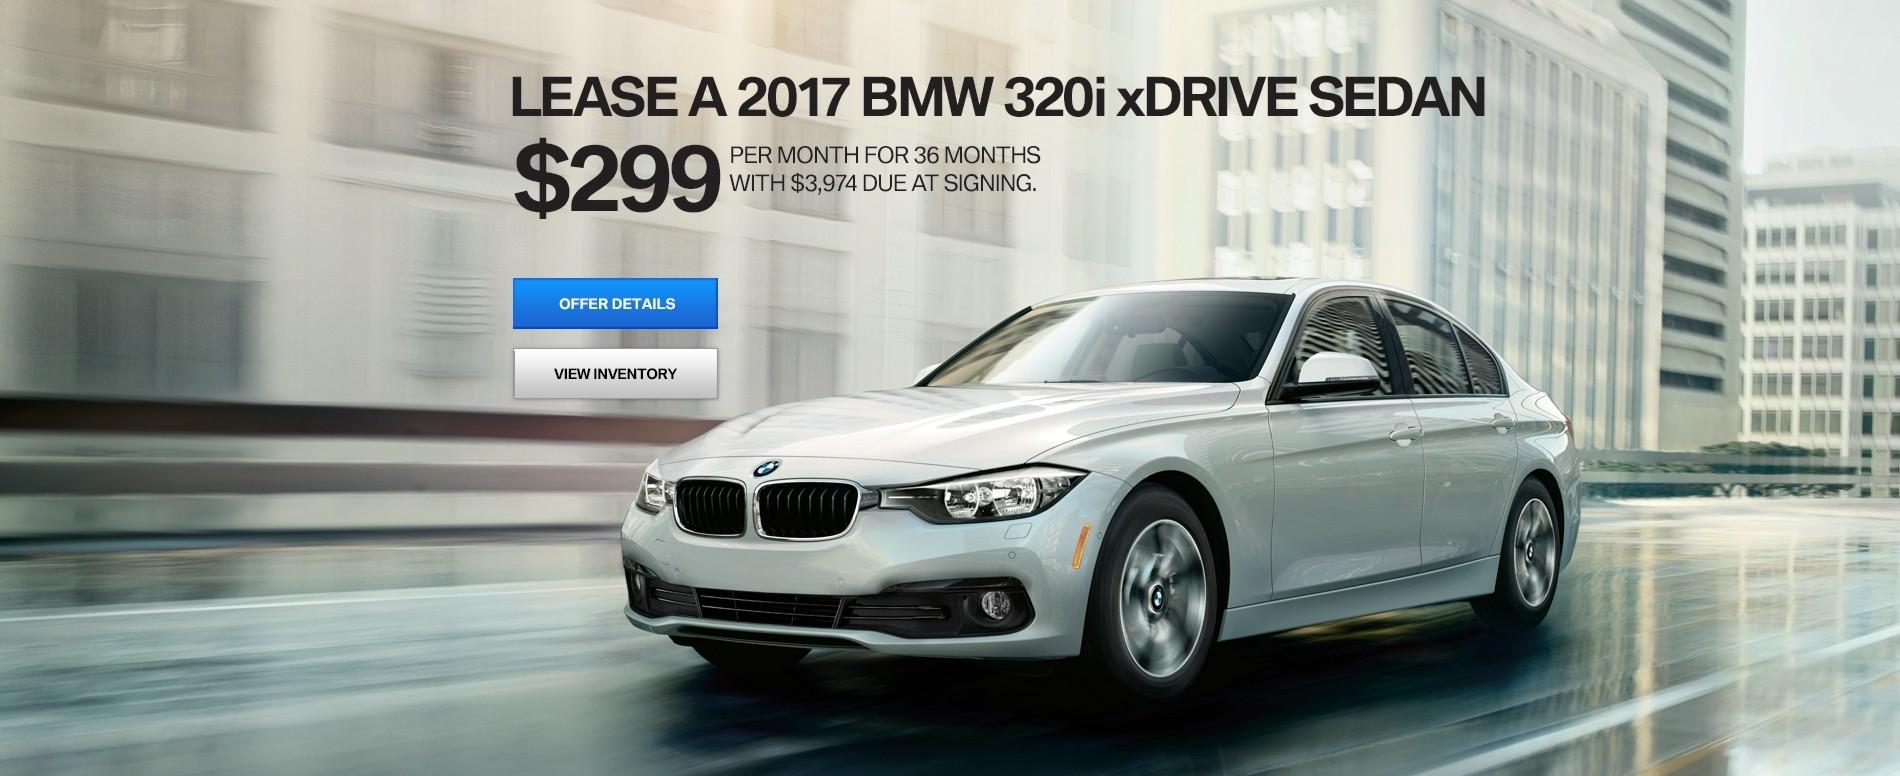 2017_320i_xDrive_Sedan_1900x776